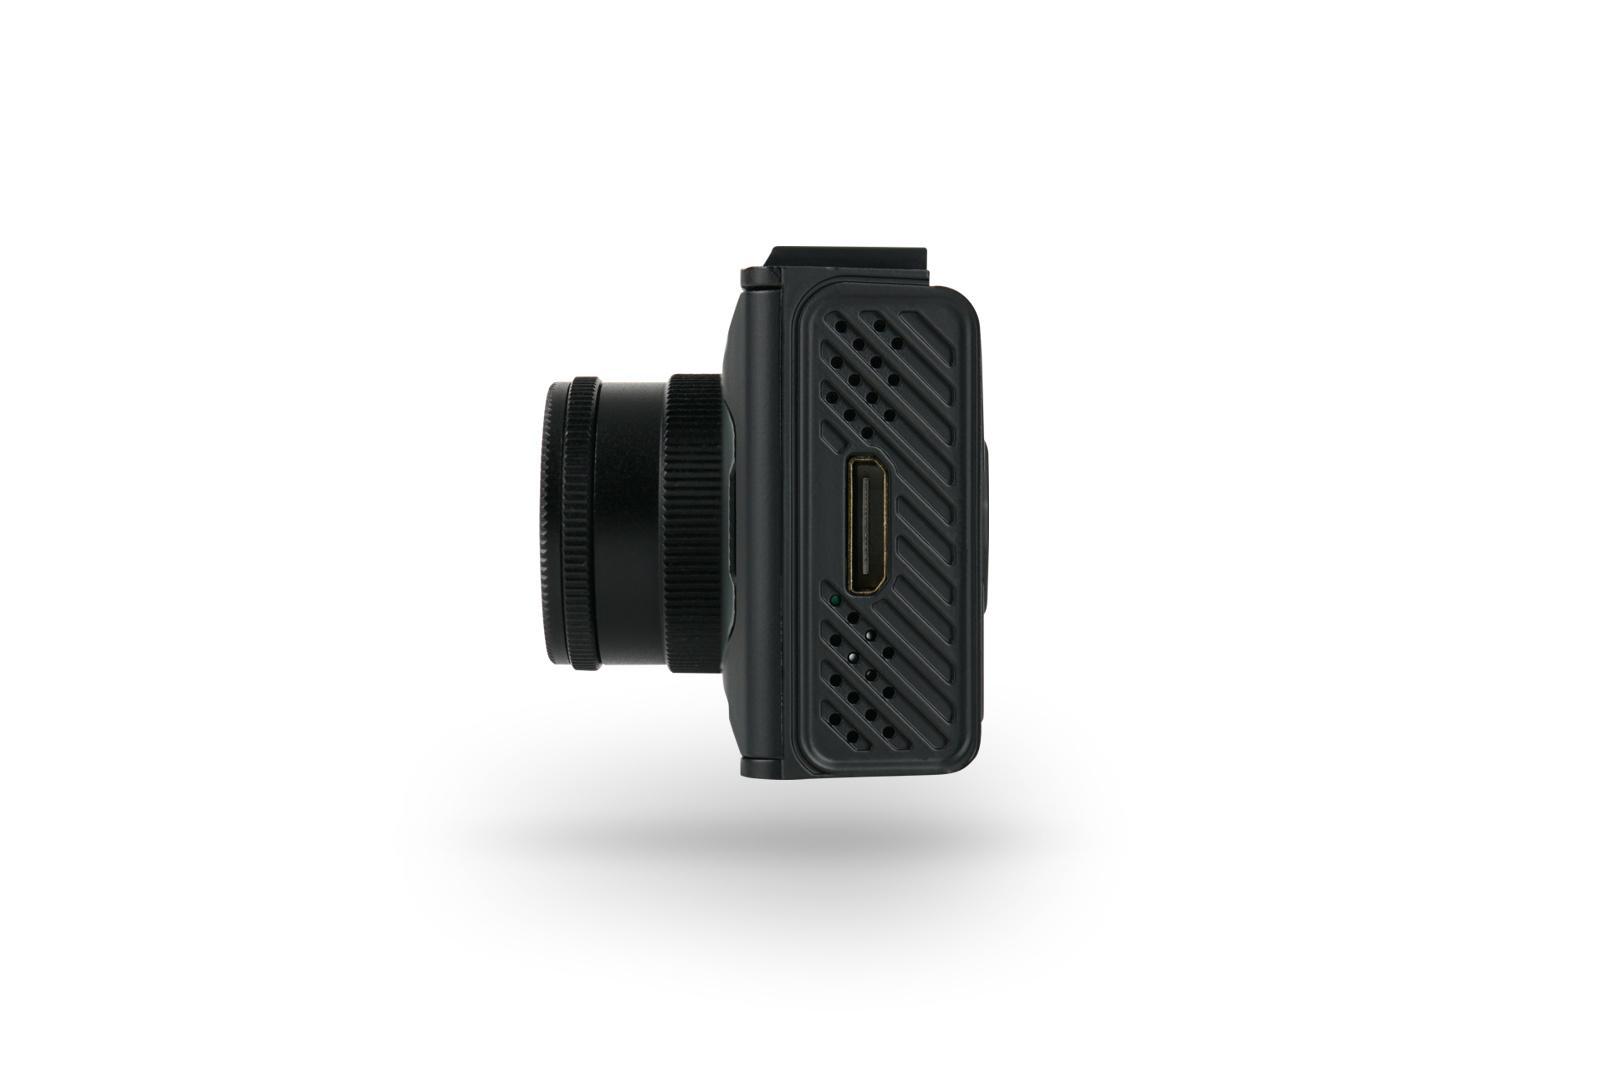 Caméra de bord XBLITZ TRUST connaissances d'experts